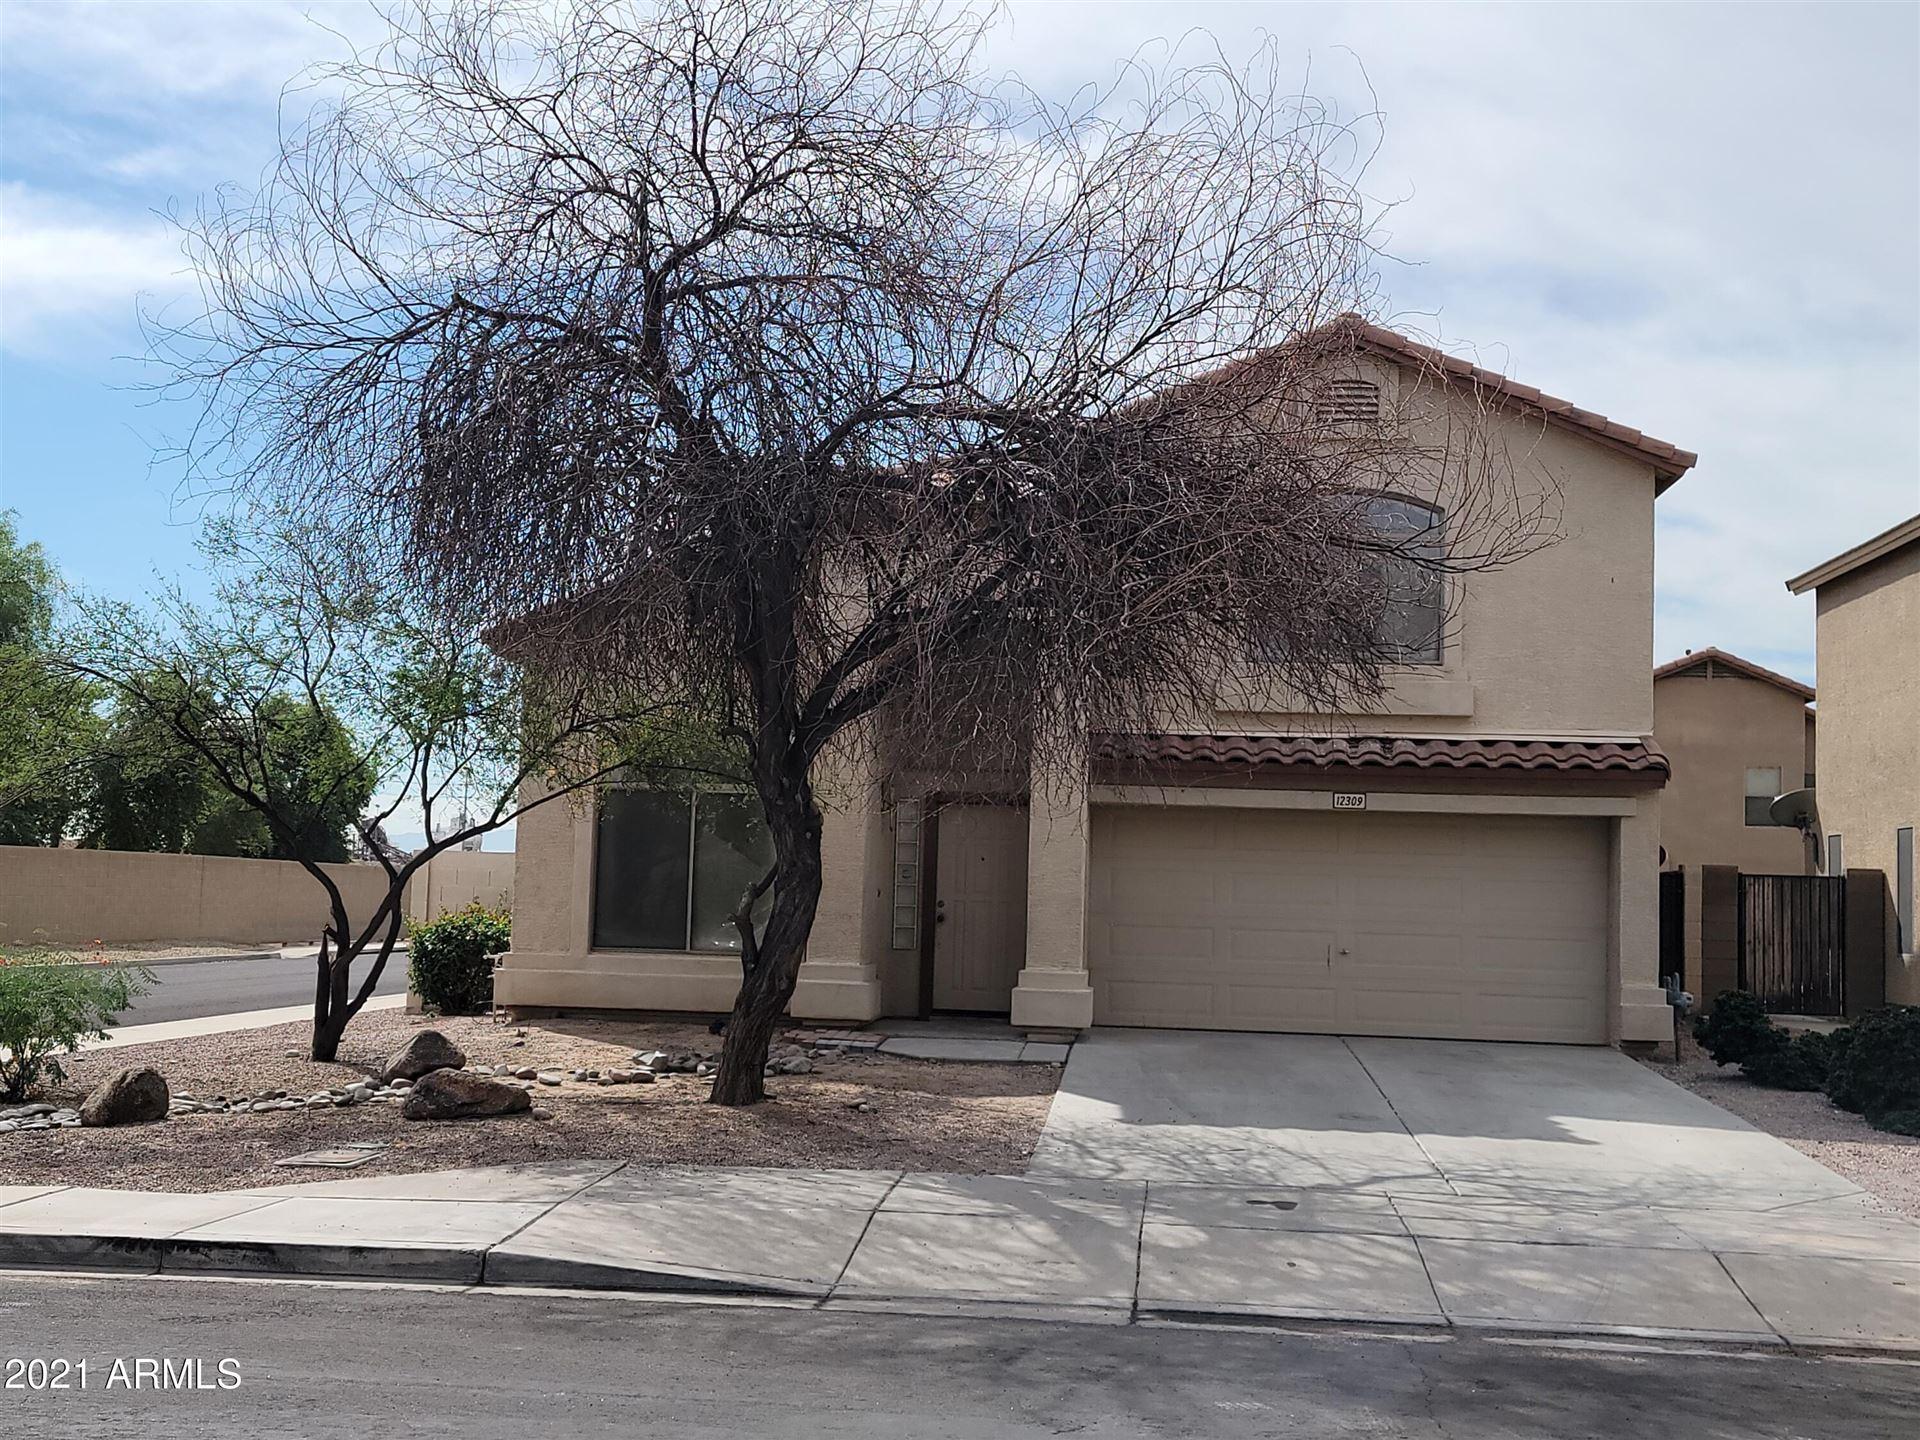 Photo of 12309 W EL NIDO Lane, Litchfield Park, AZ 85340 (MLS # 6305264)